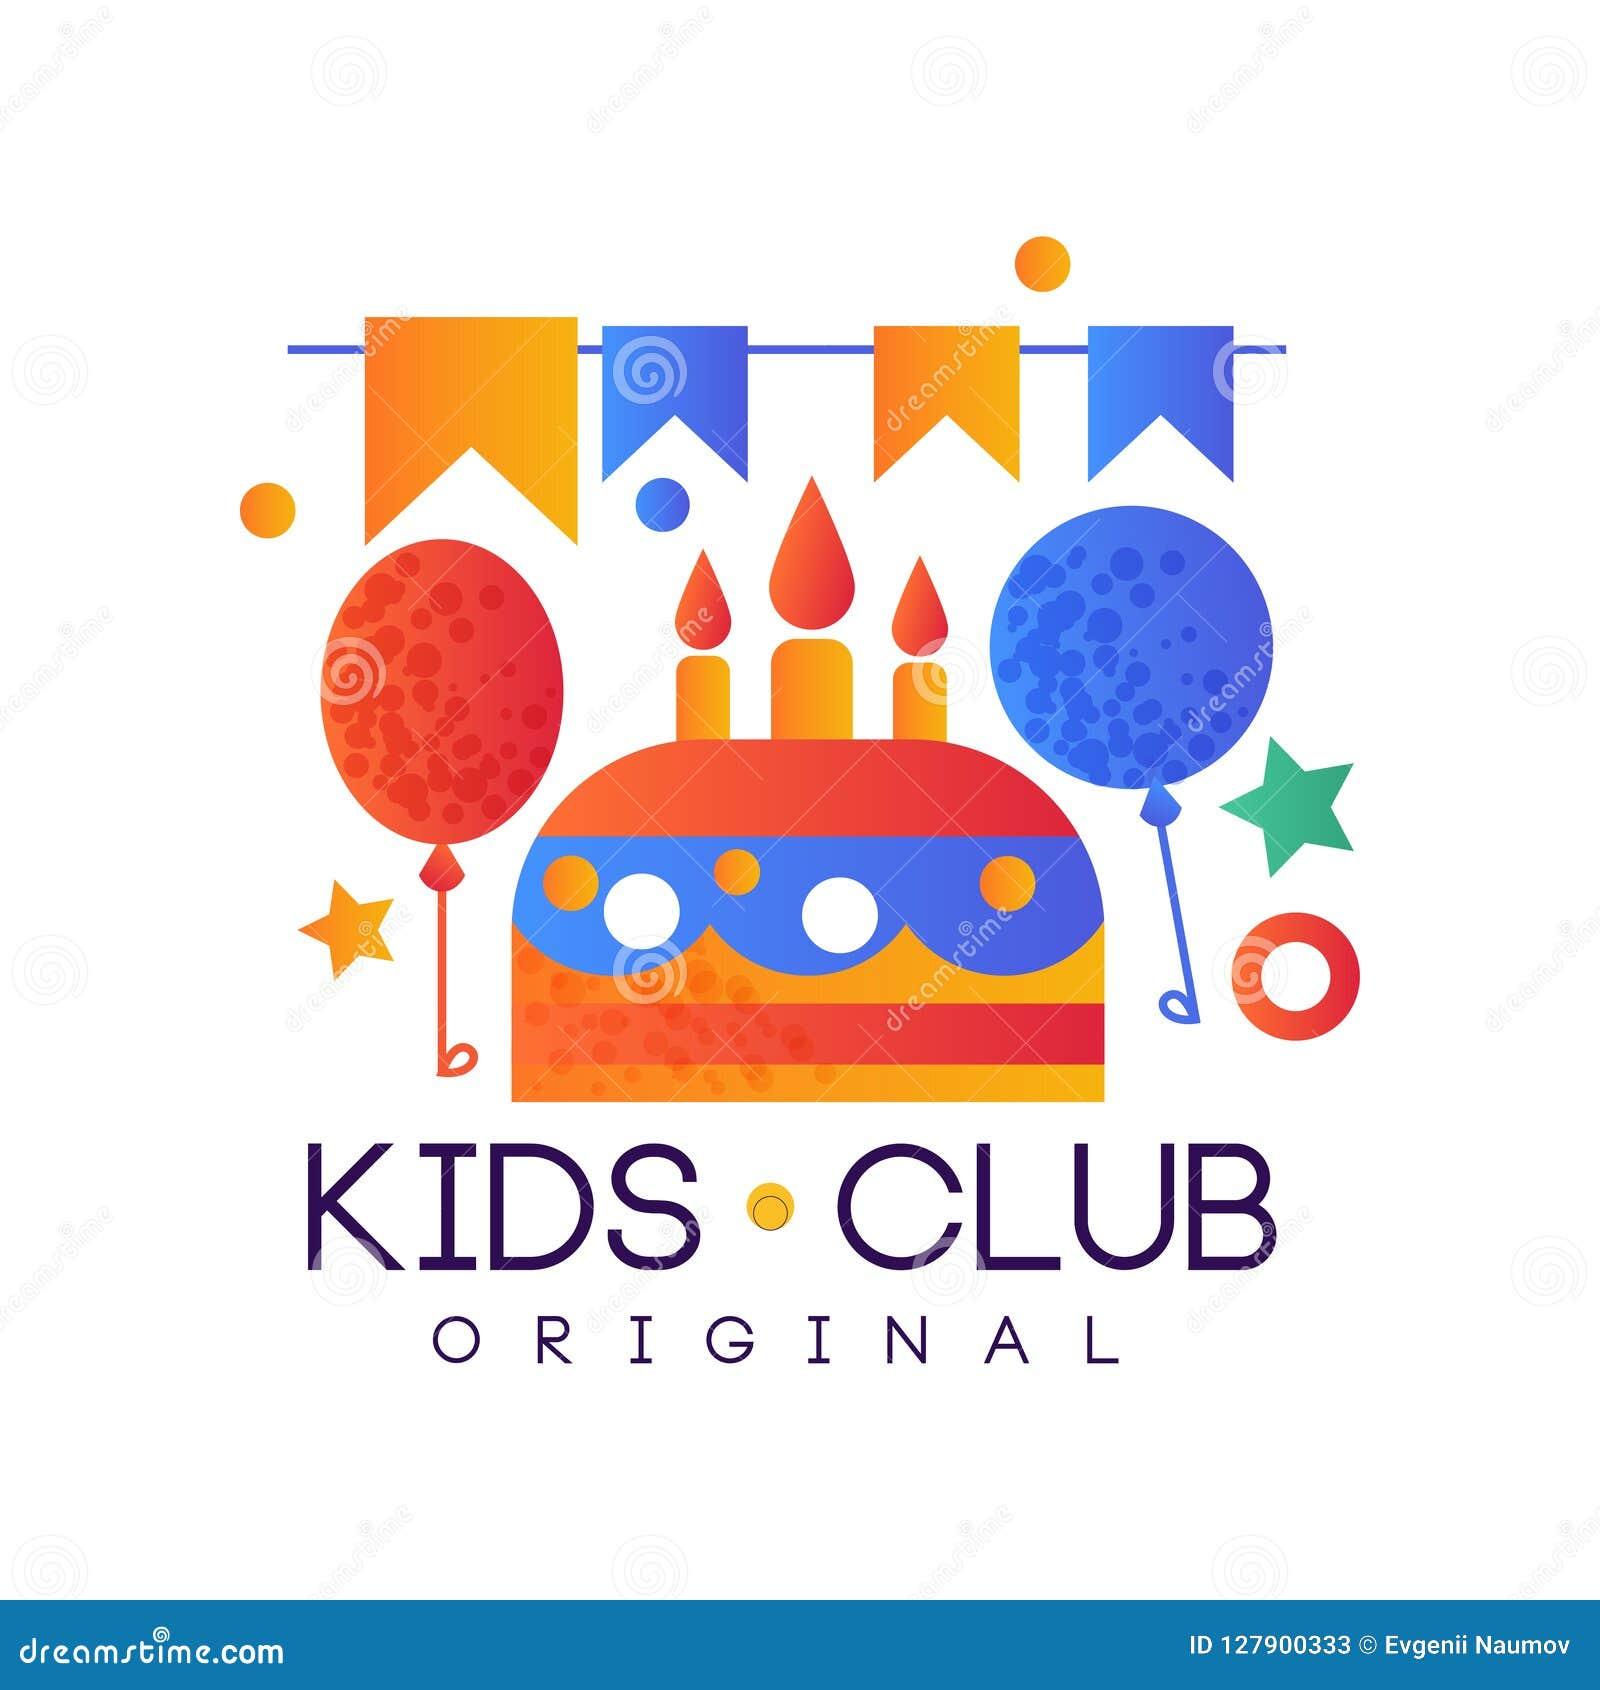 Kids Club Logo Original Colorful Creative Label Template